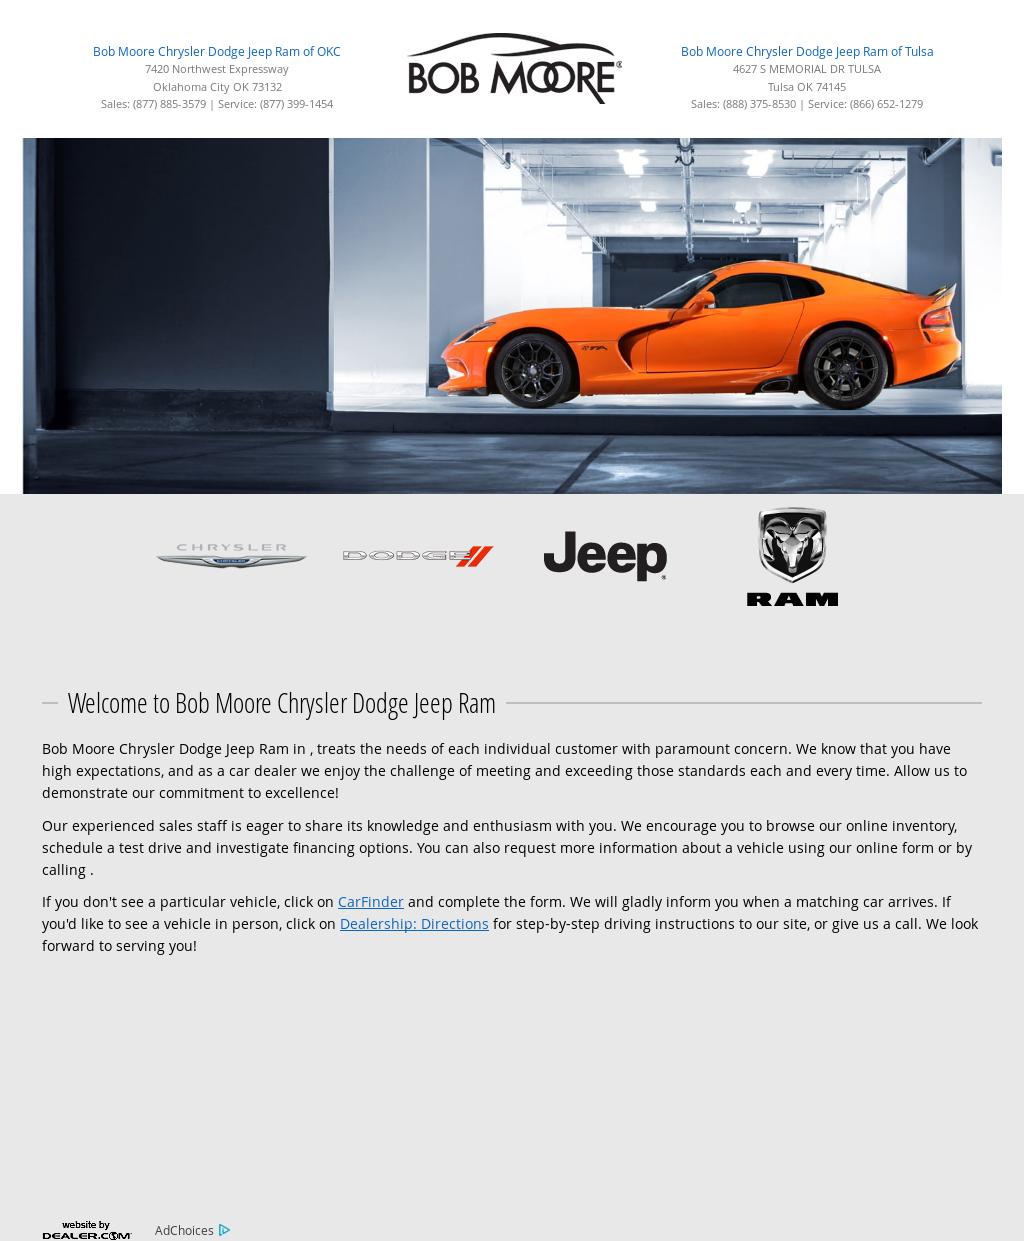 Bob Moore Chrysler Dodge Jeep Ram Website History